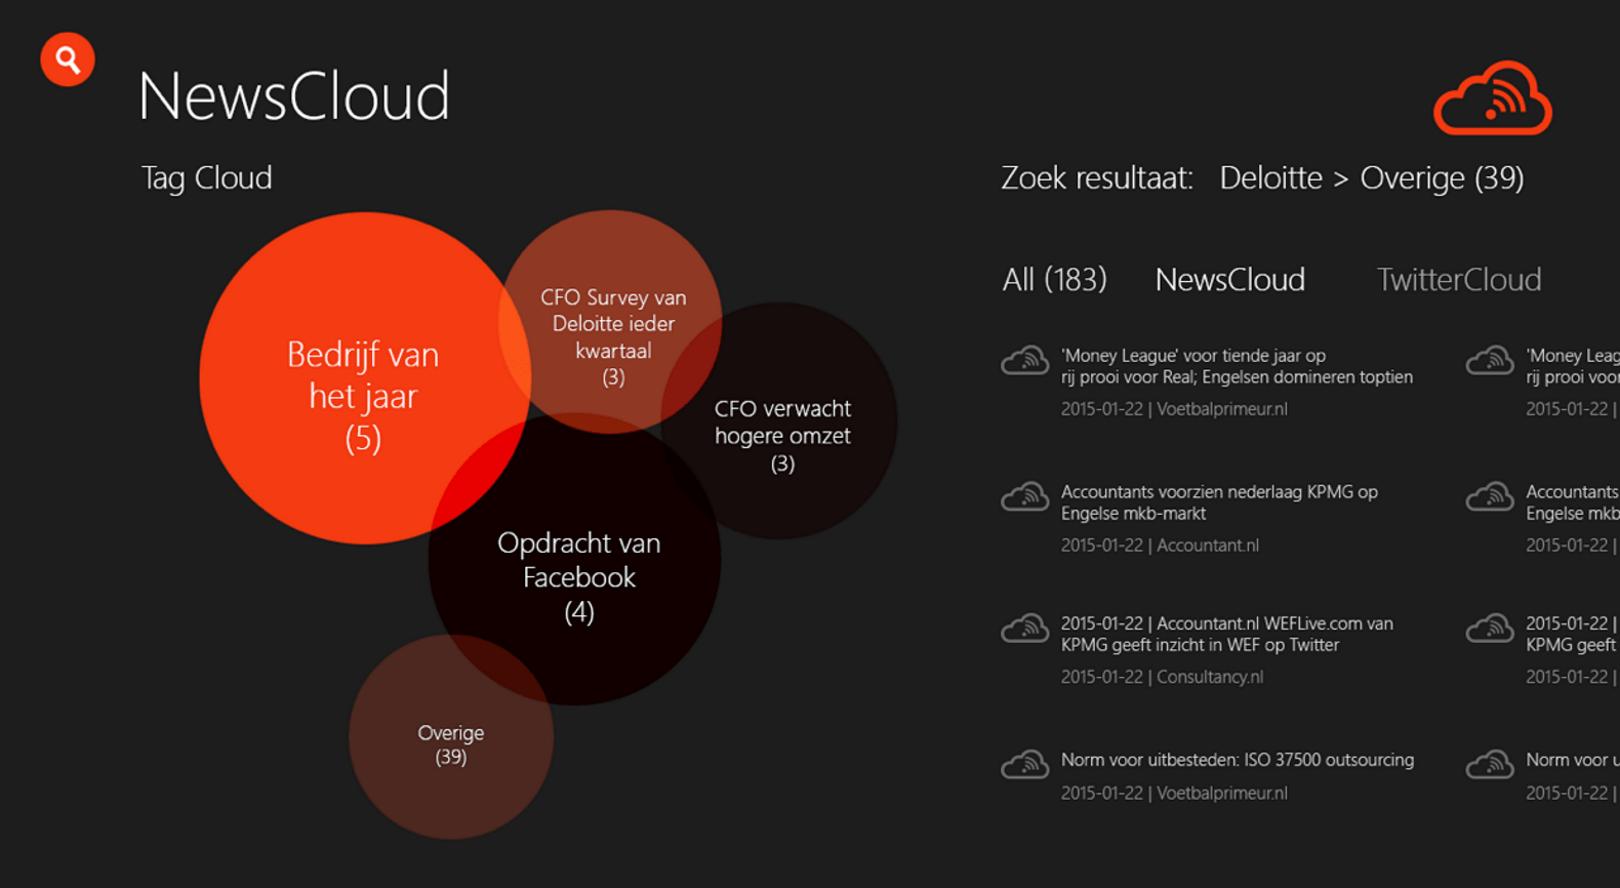 HowardsHome API Microsoft Outlook integratie